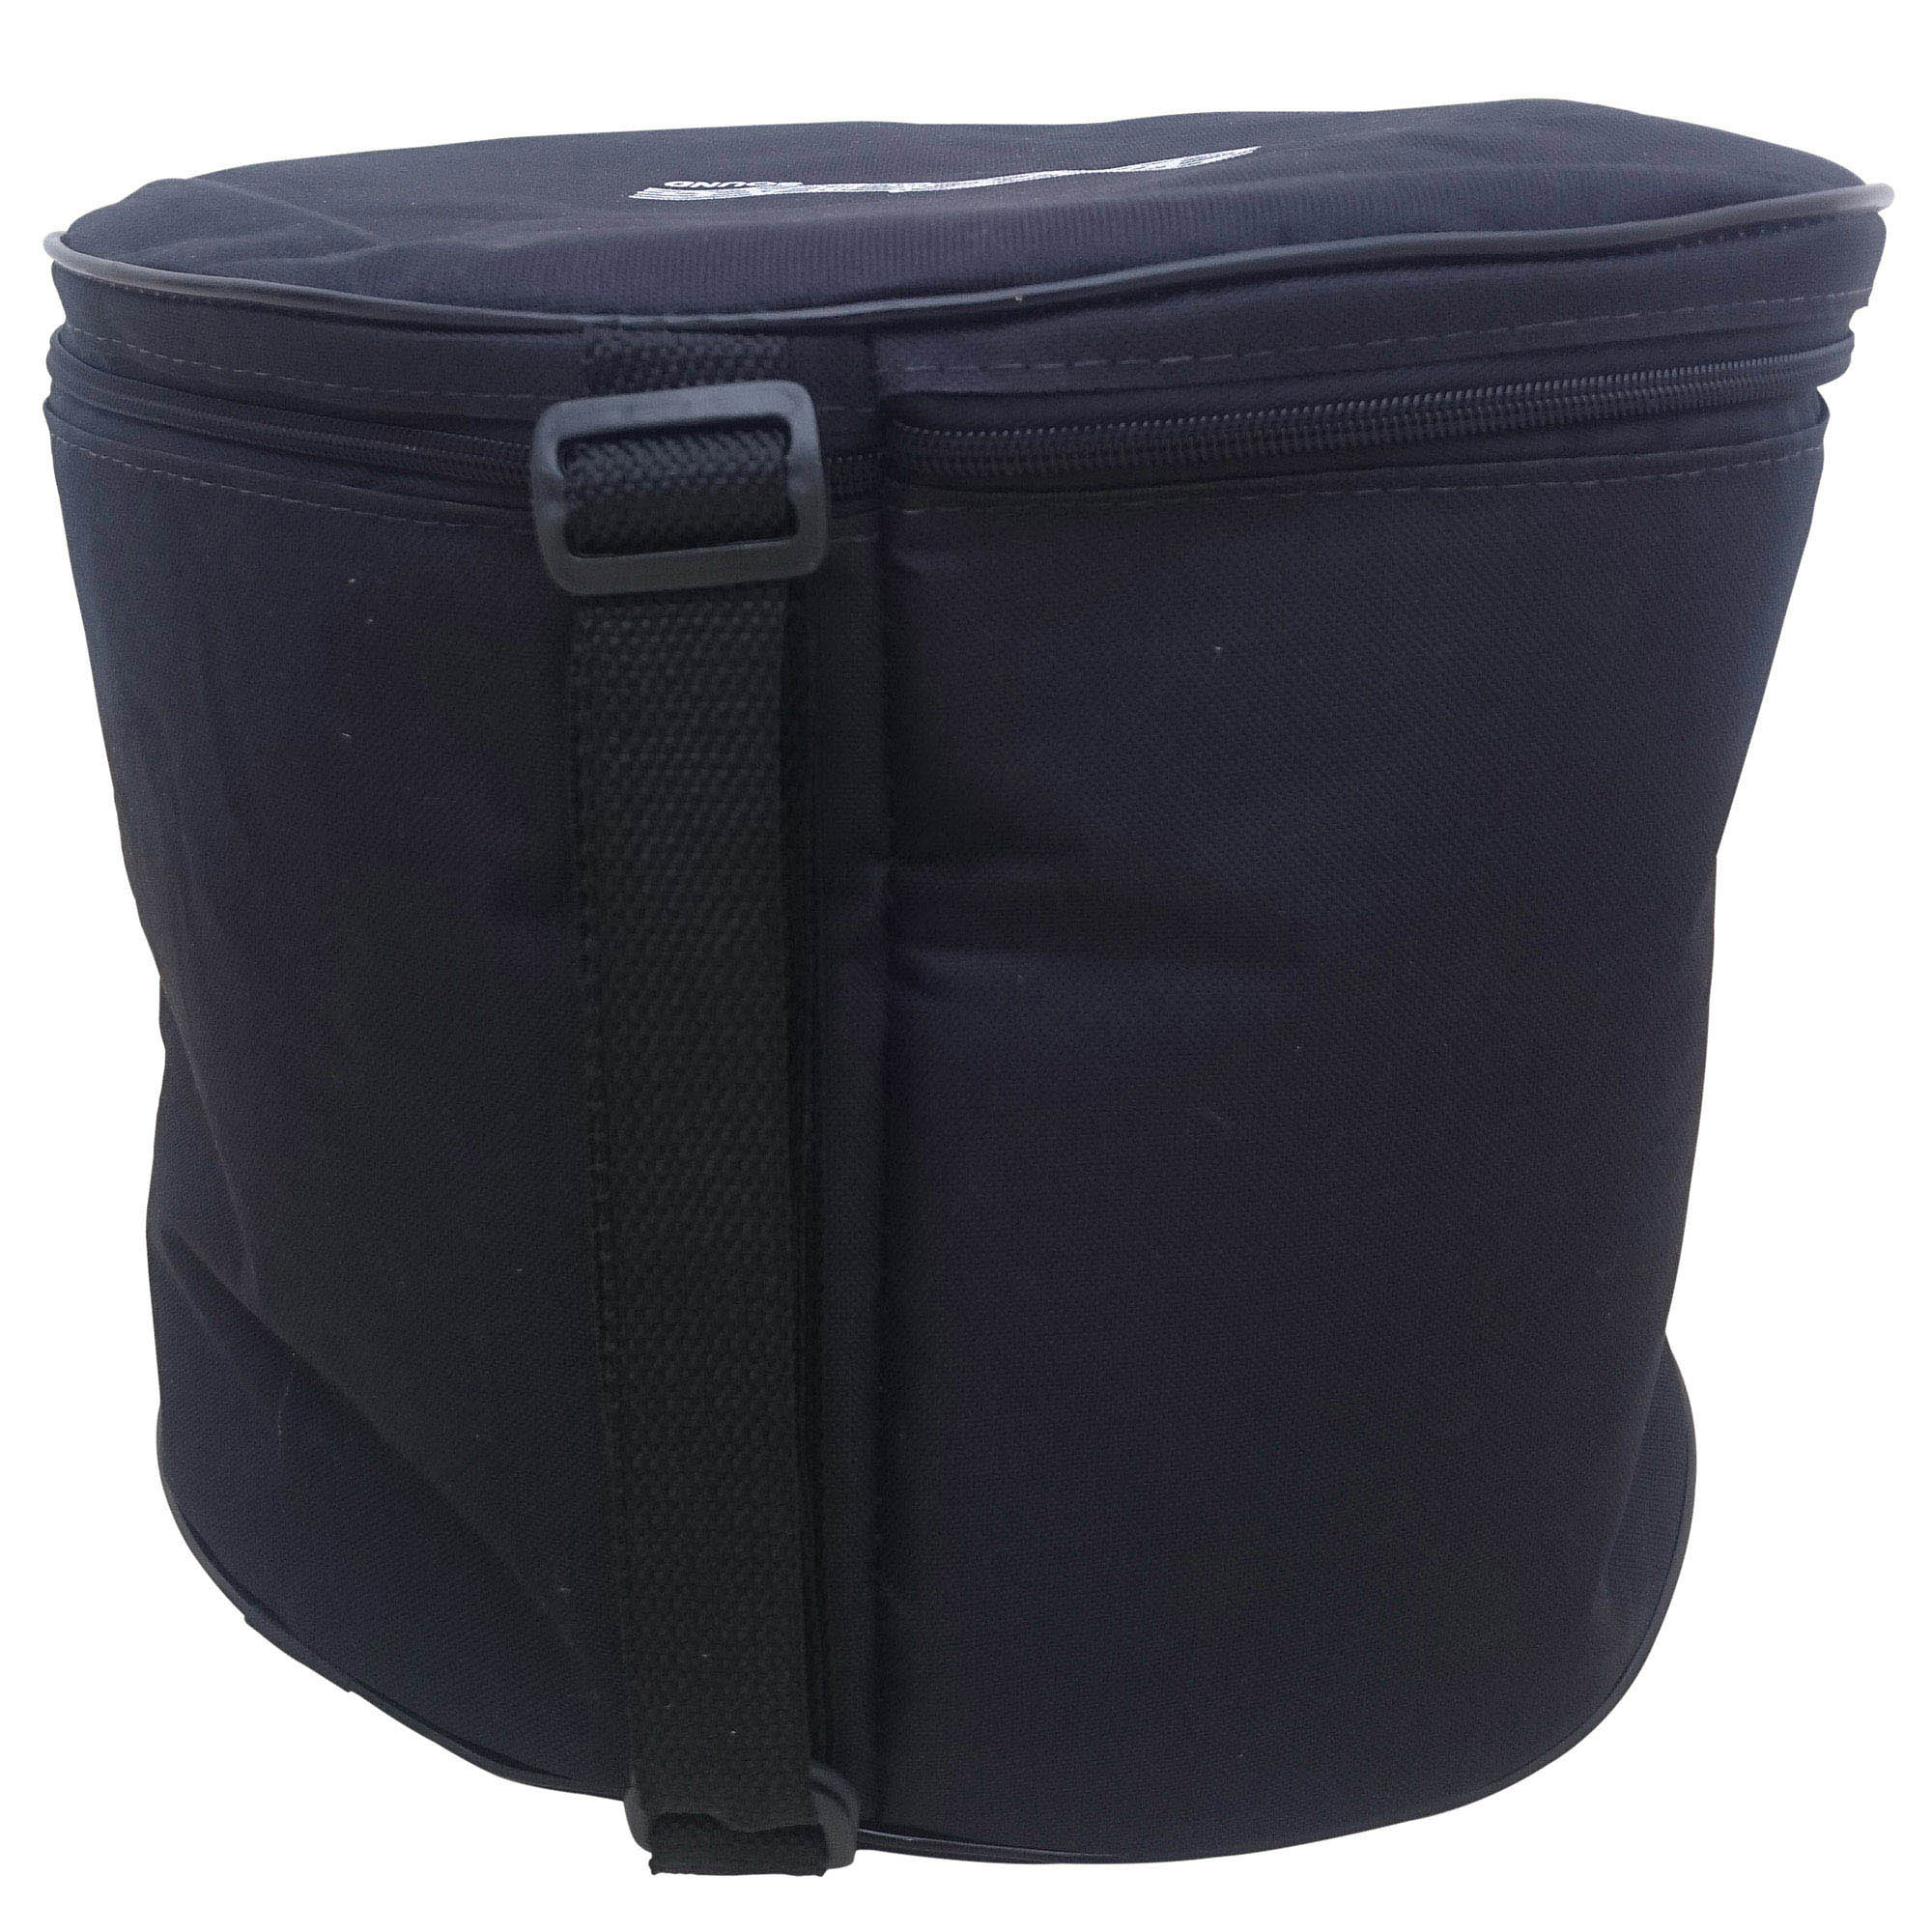 "Capa Bag Extra Luxo para Surdo 16"" para Bateria CLAVE & BAG. Totalmente acolhoado  - ROOSTERMUSIC"